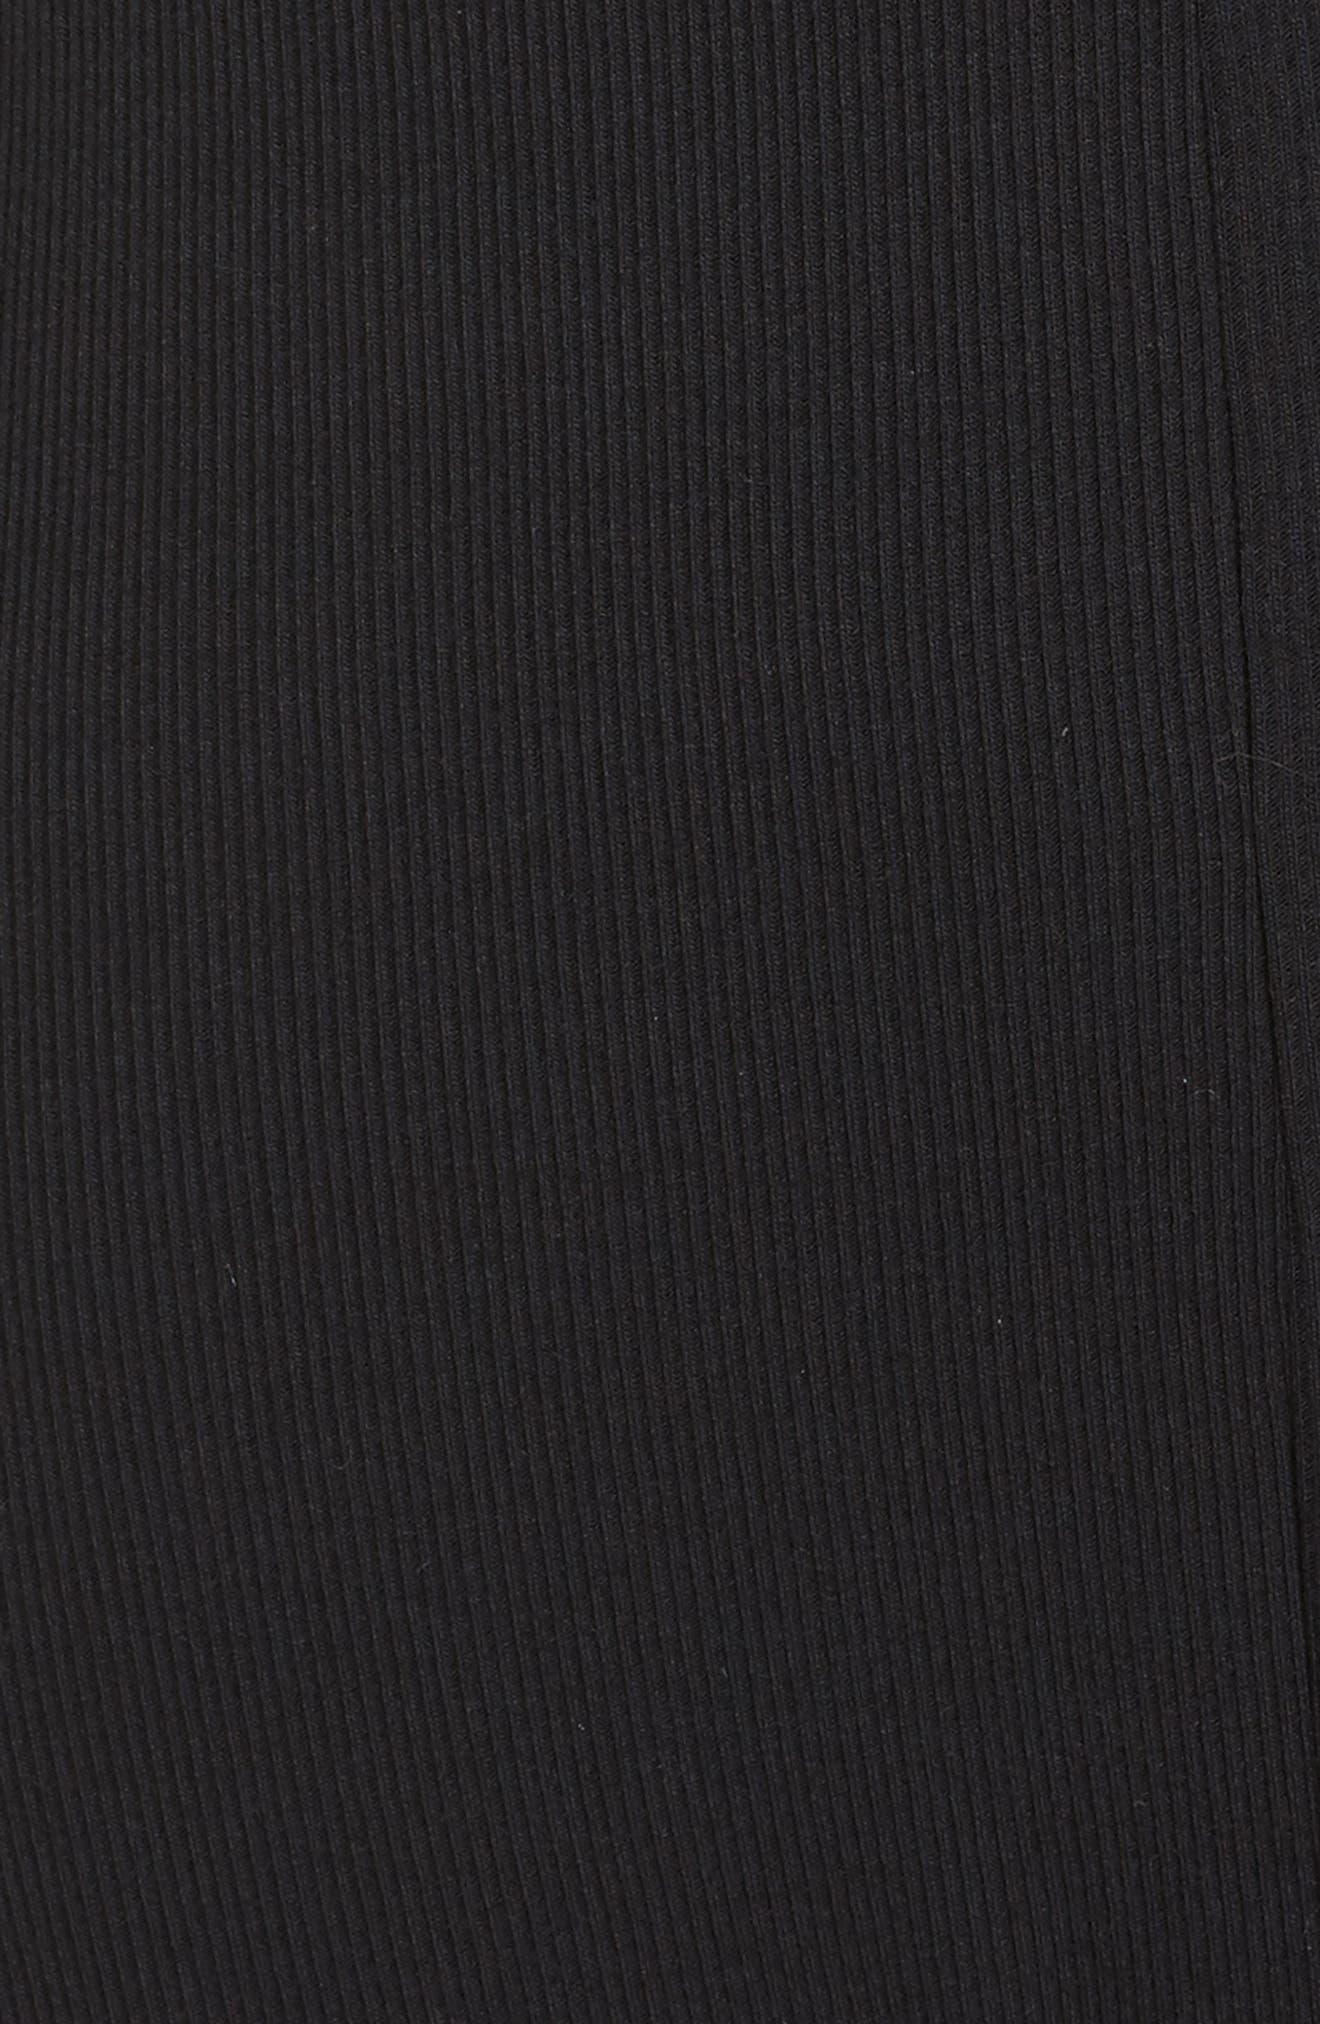 For You Bodysuit,                             Alternate thumbnail 5, color,                             001